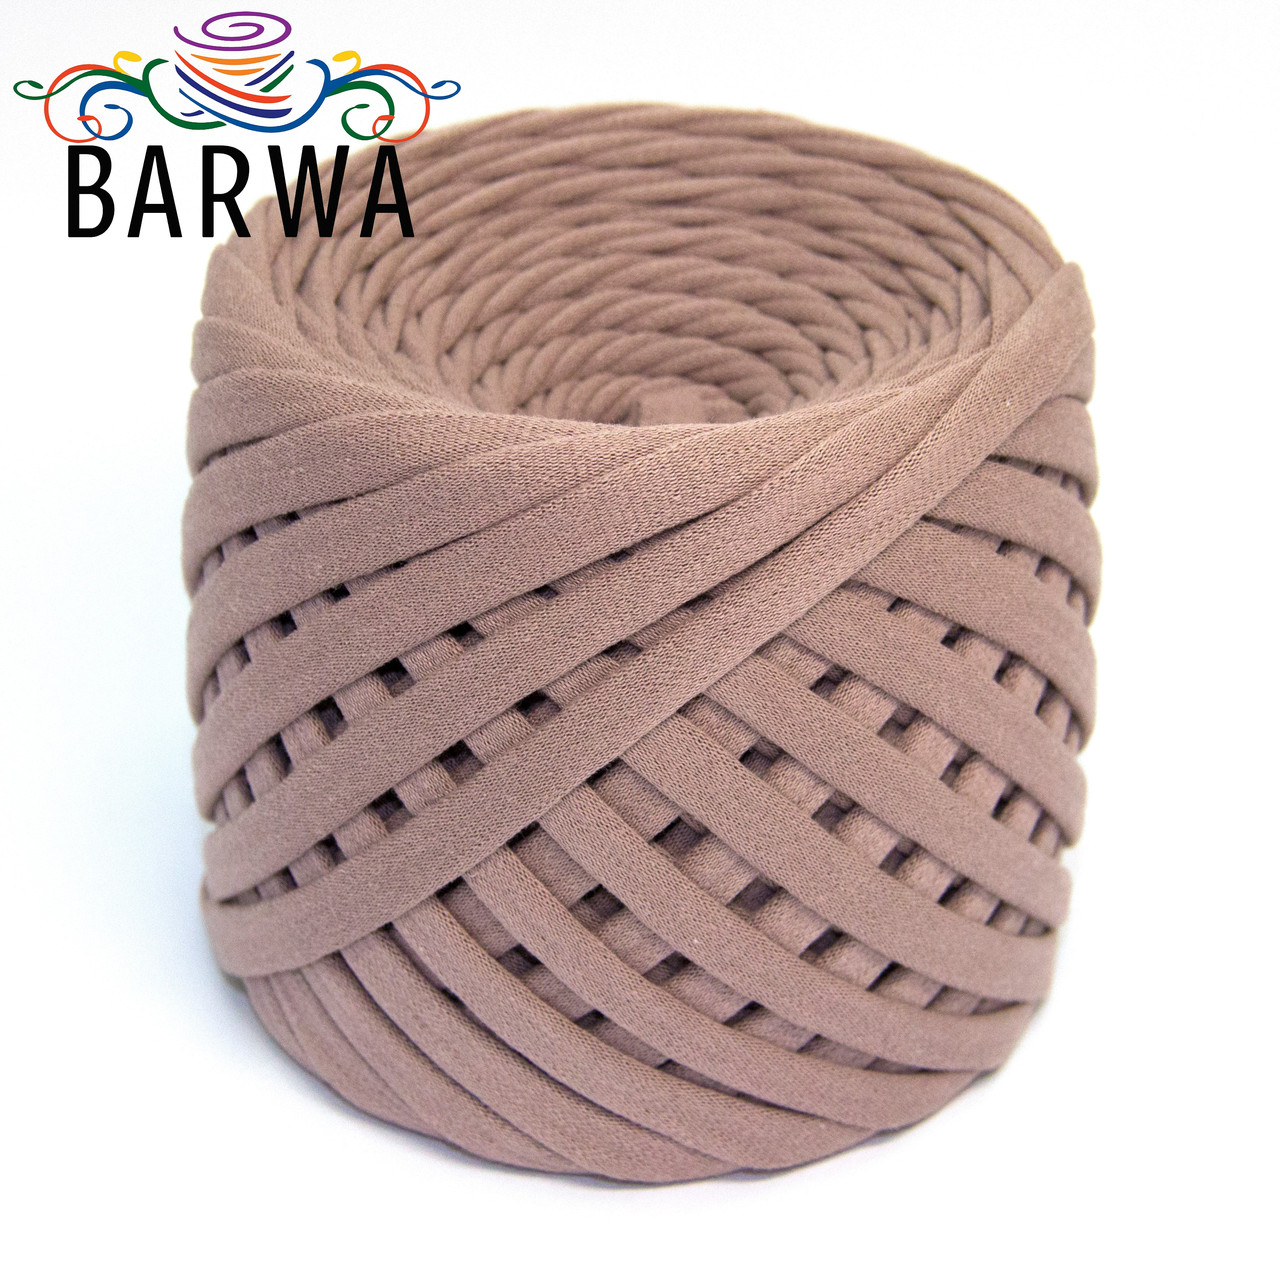 Трикотажная пряжа BARWA standart 7-9 мм. 50 м. цвет Визон